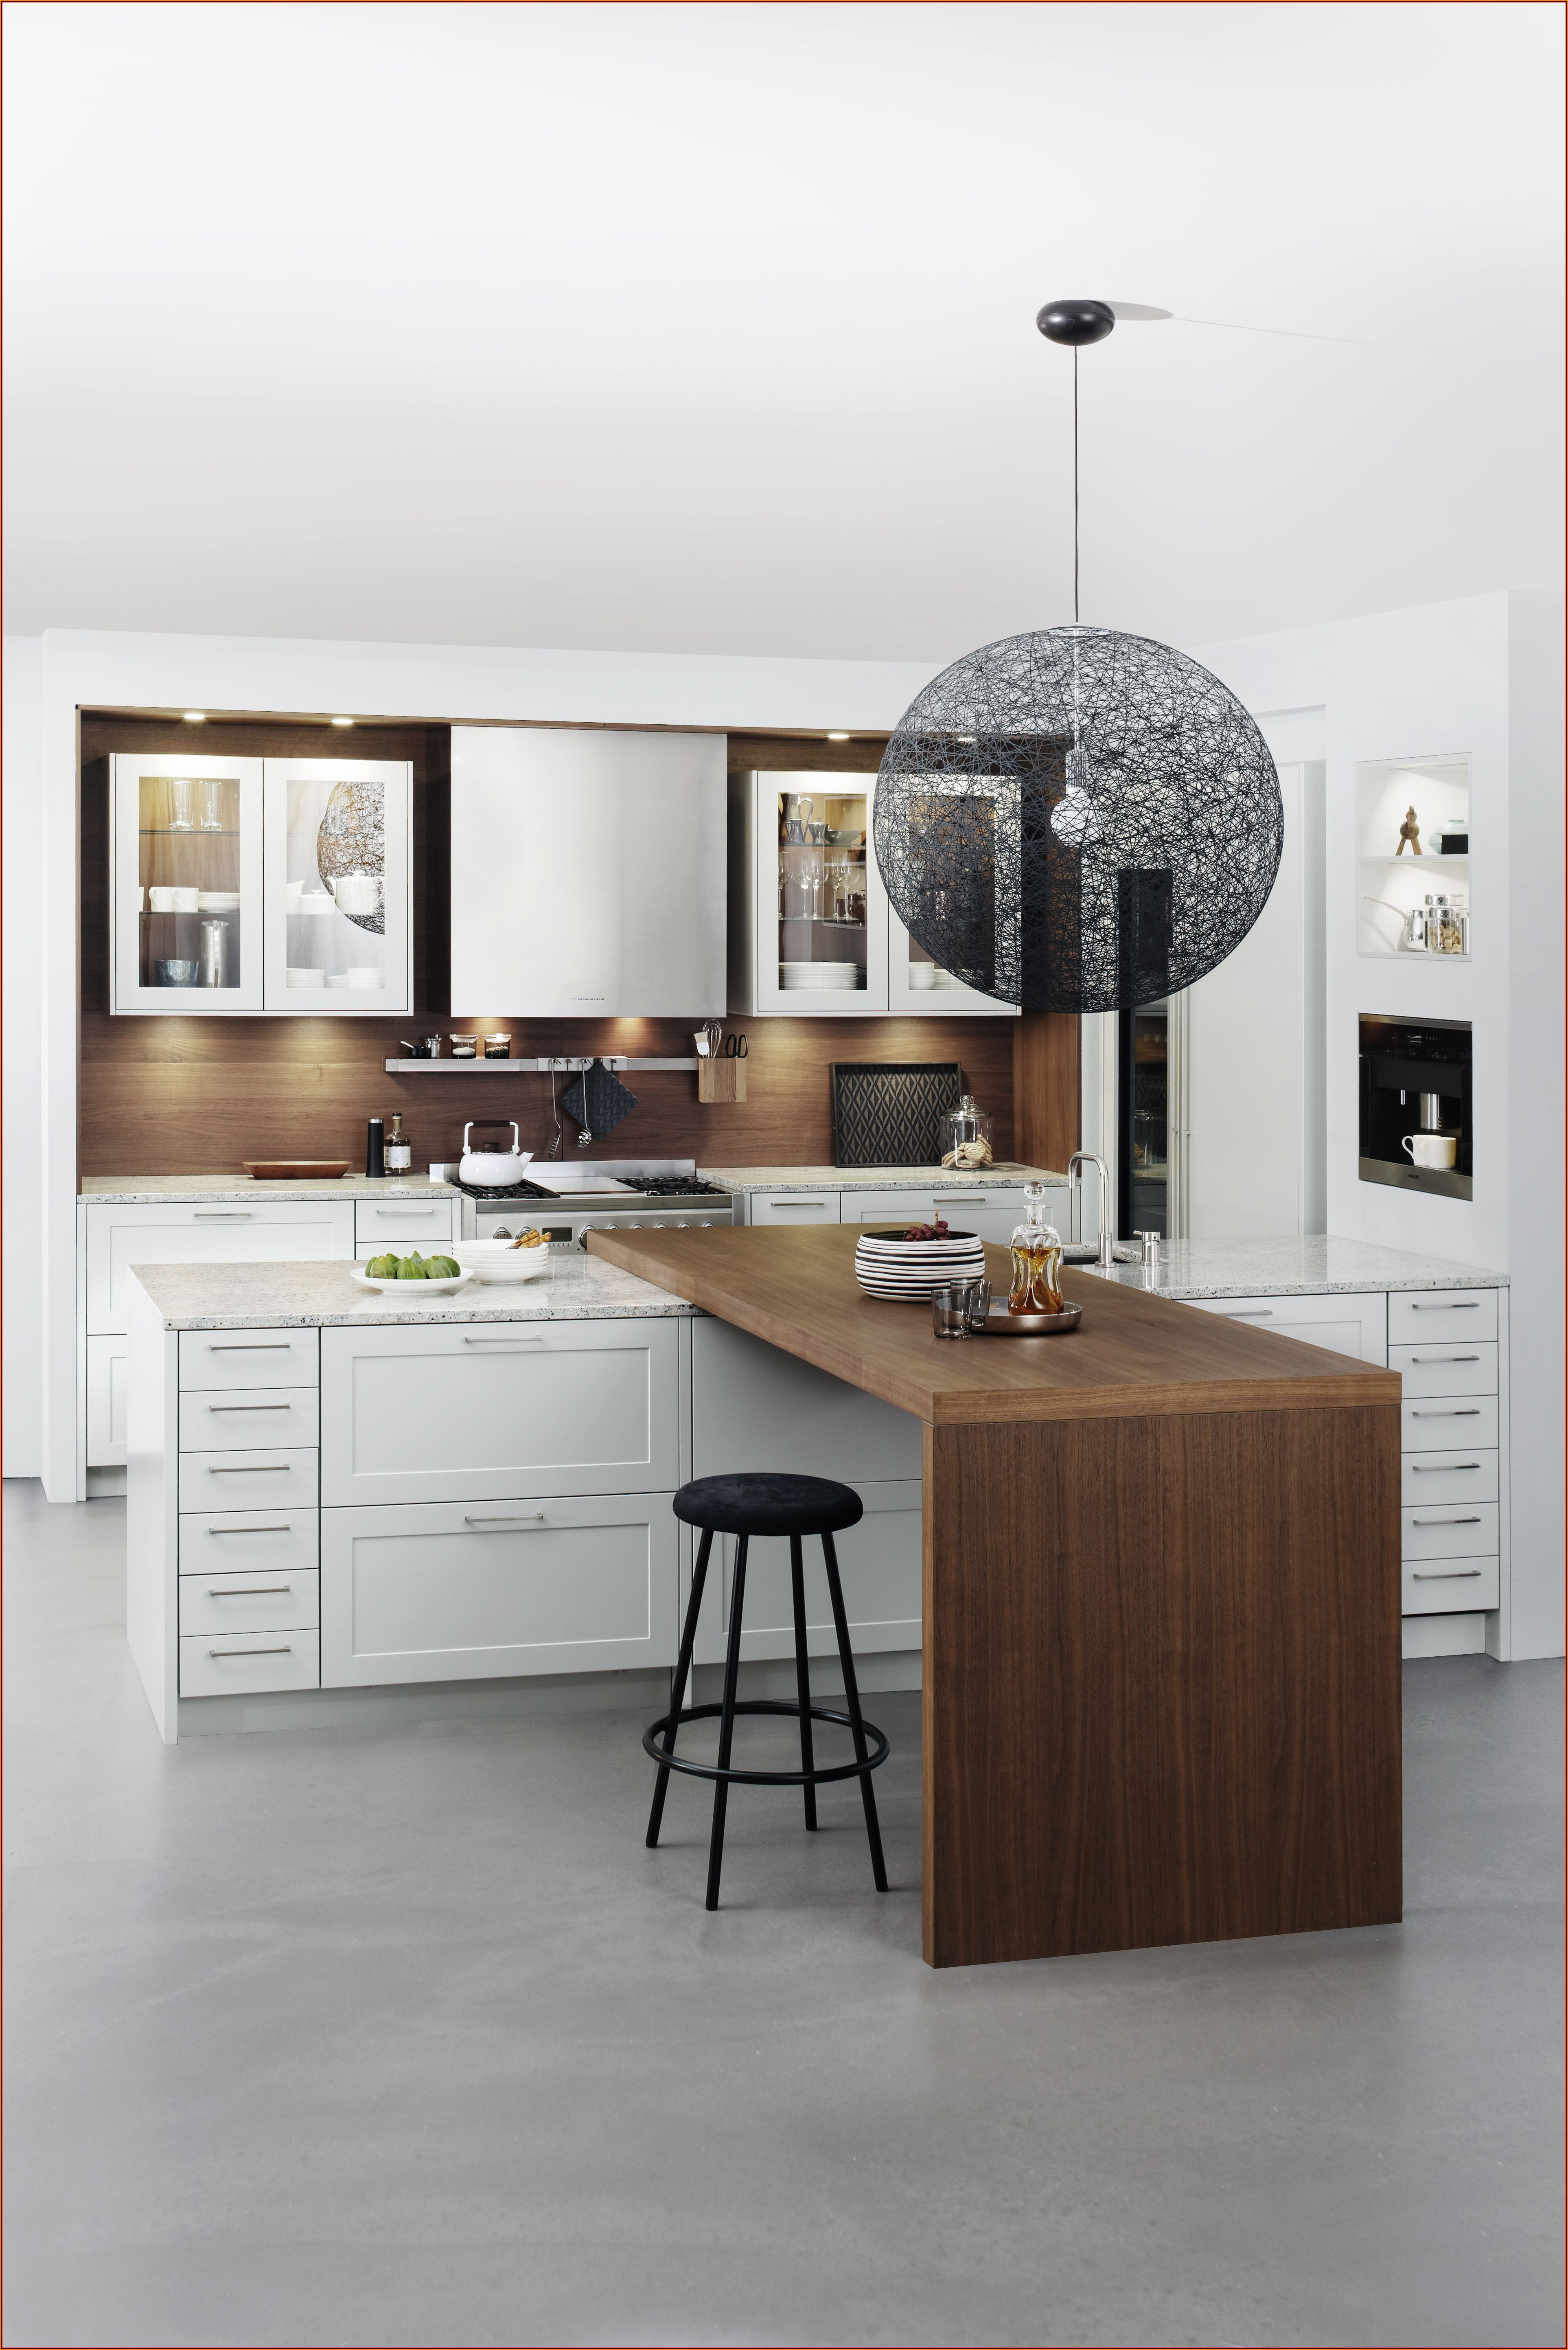 Leicht Küchen Ideen